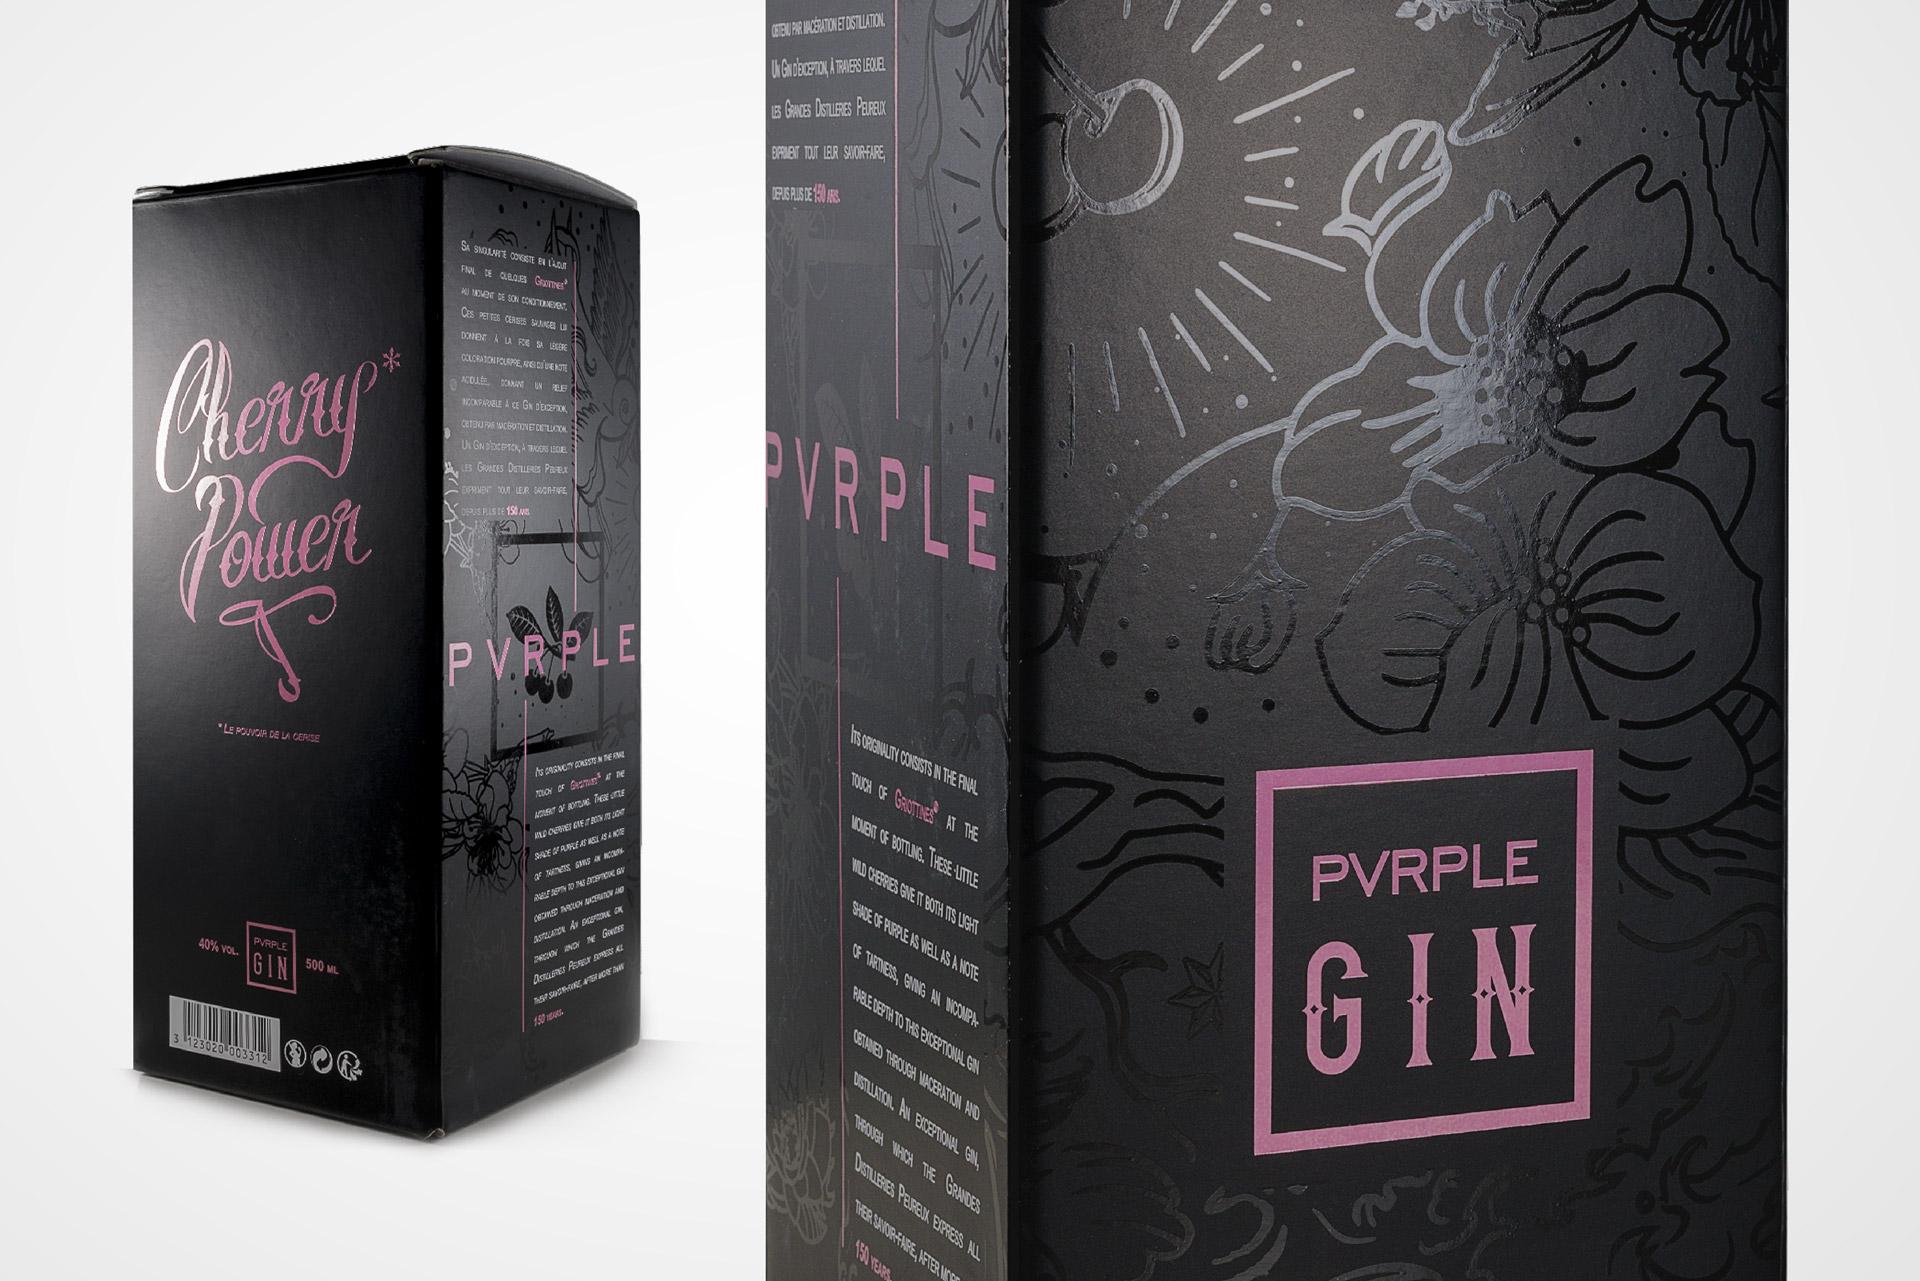 Packaging design Pvrple Gin